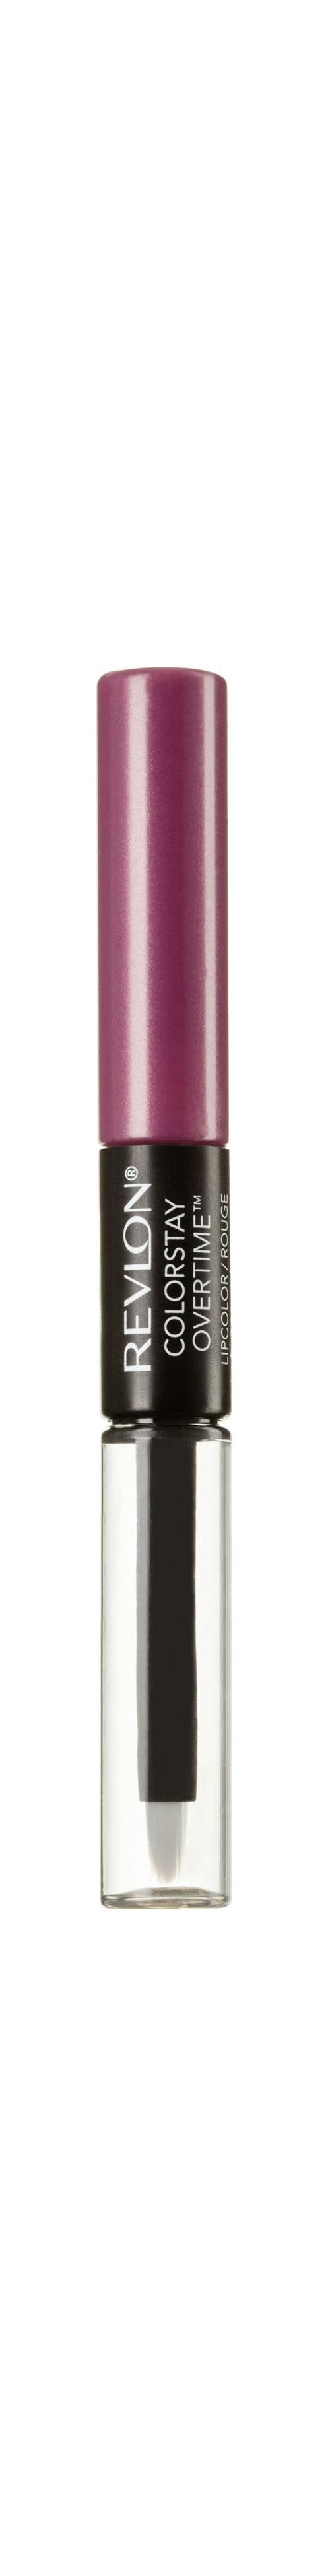 Revlon Colorstay Overtime™ Lipcolor Keep Blushing